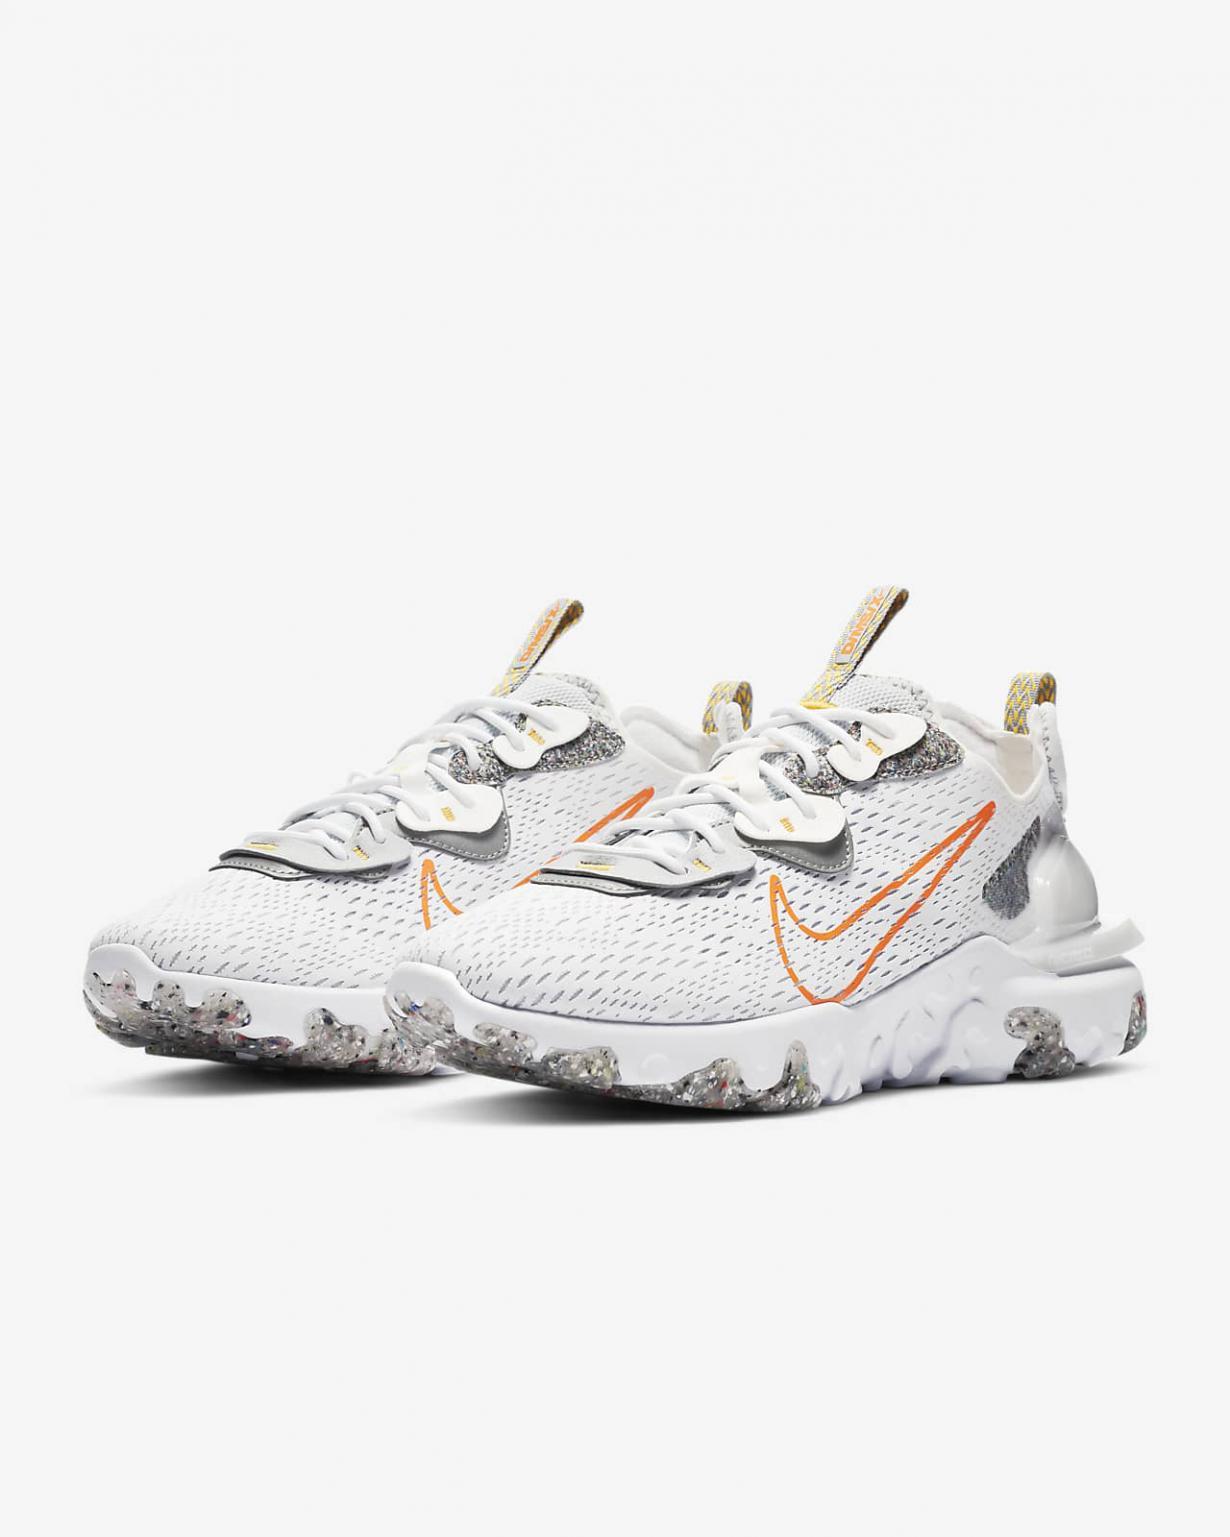 Lifestyle Homme   React Vision Blanc/Orange laser/Voile/Orange total   Nike < Gooddaytricities